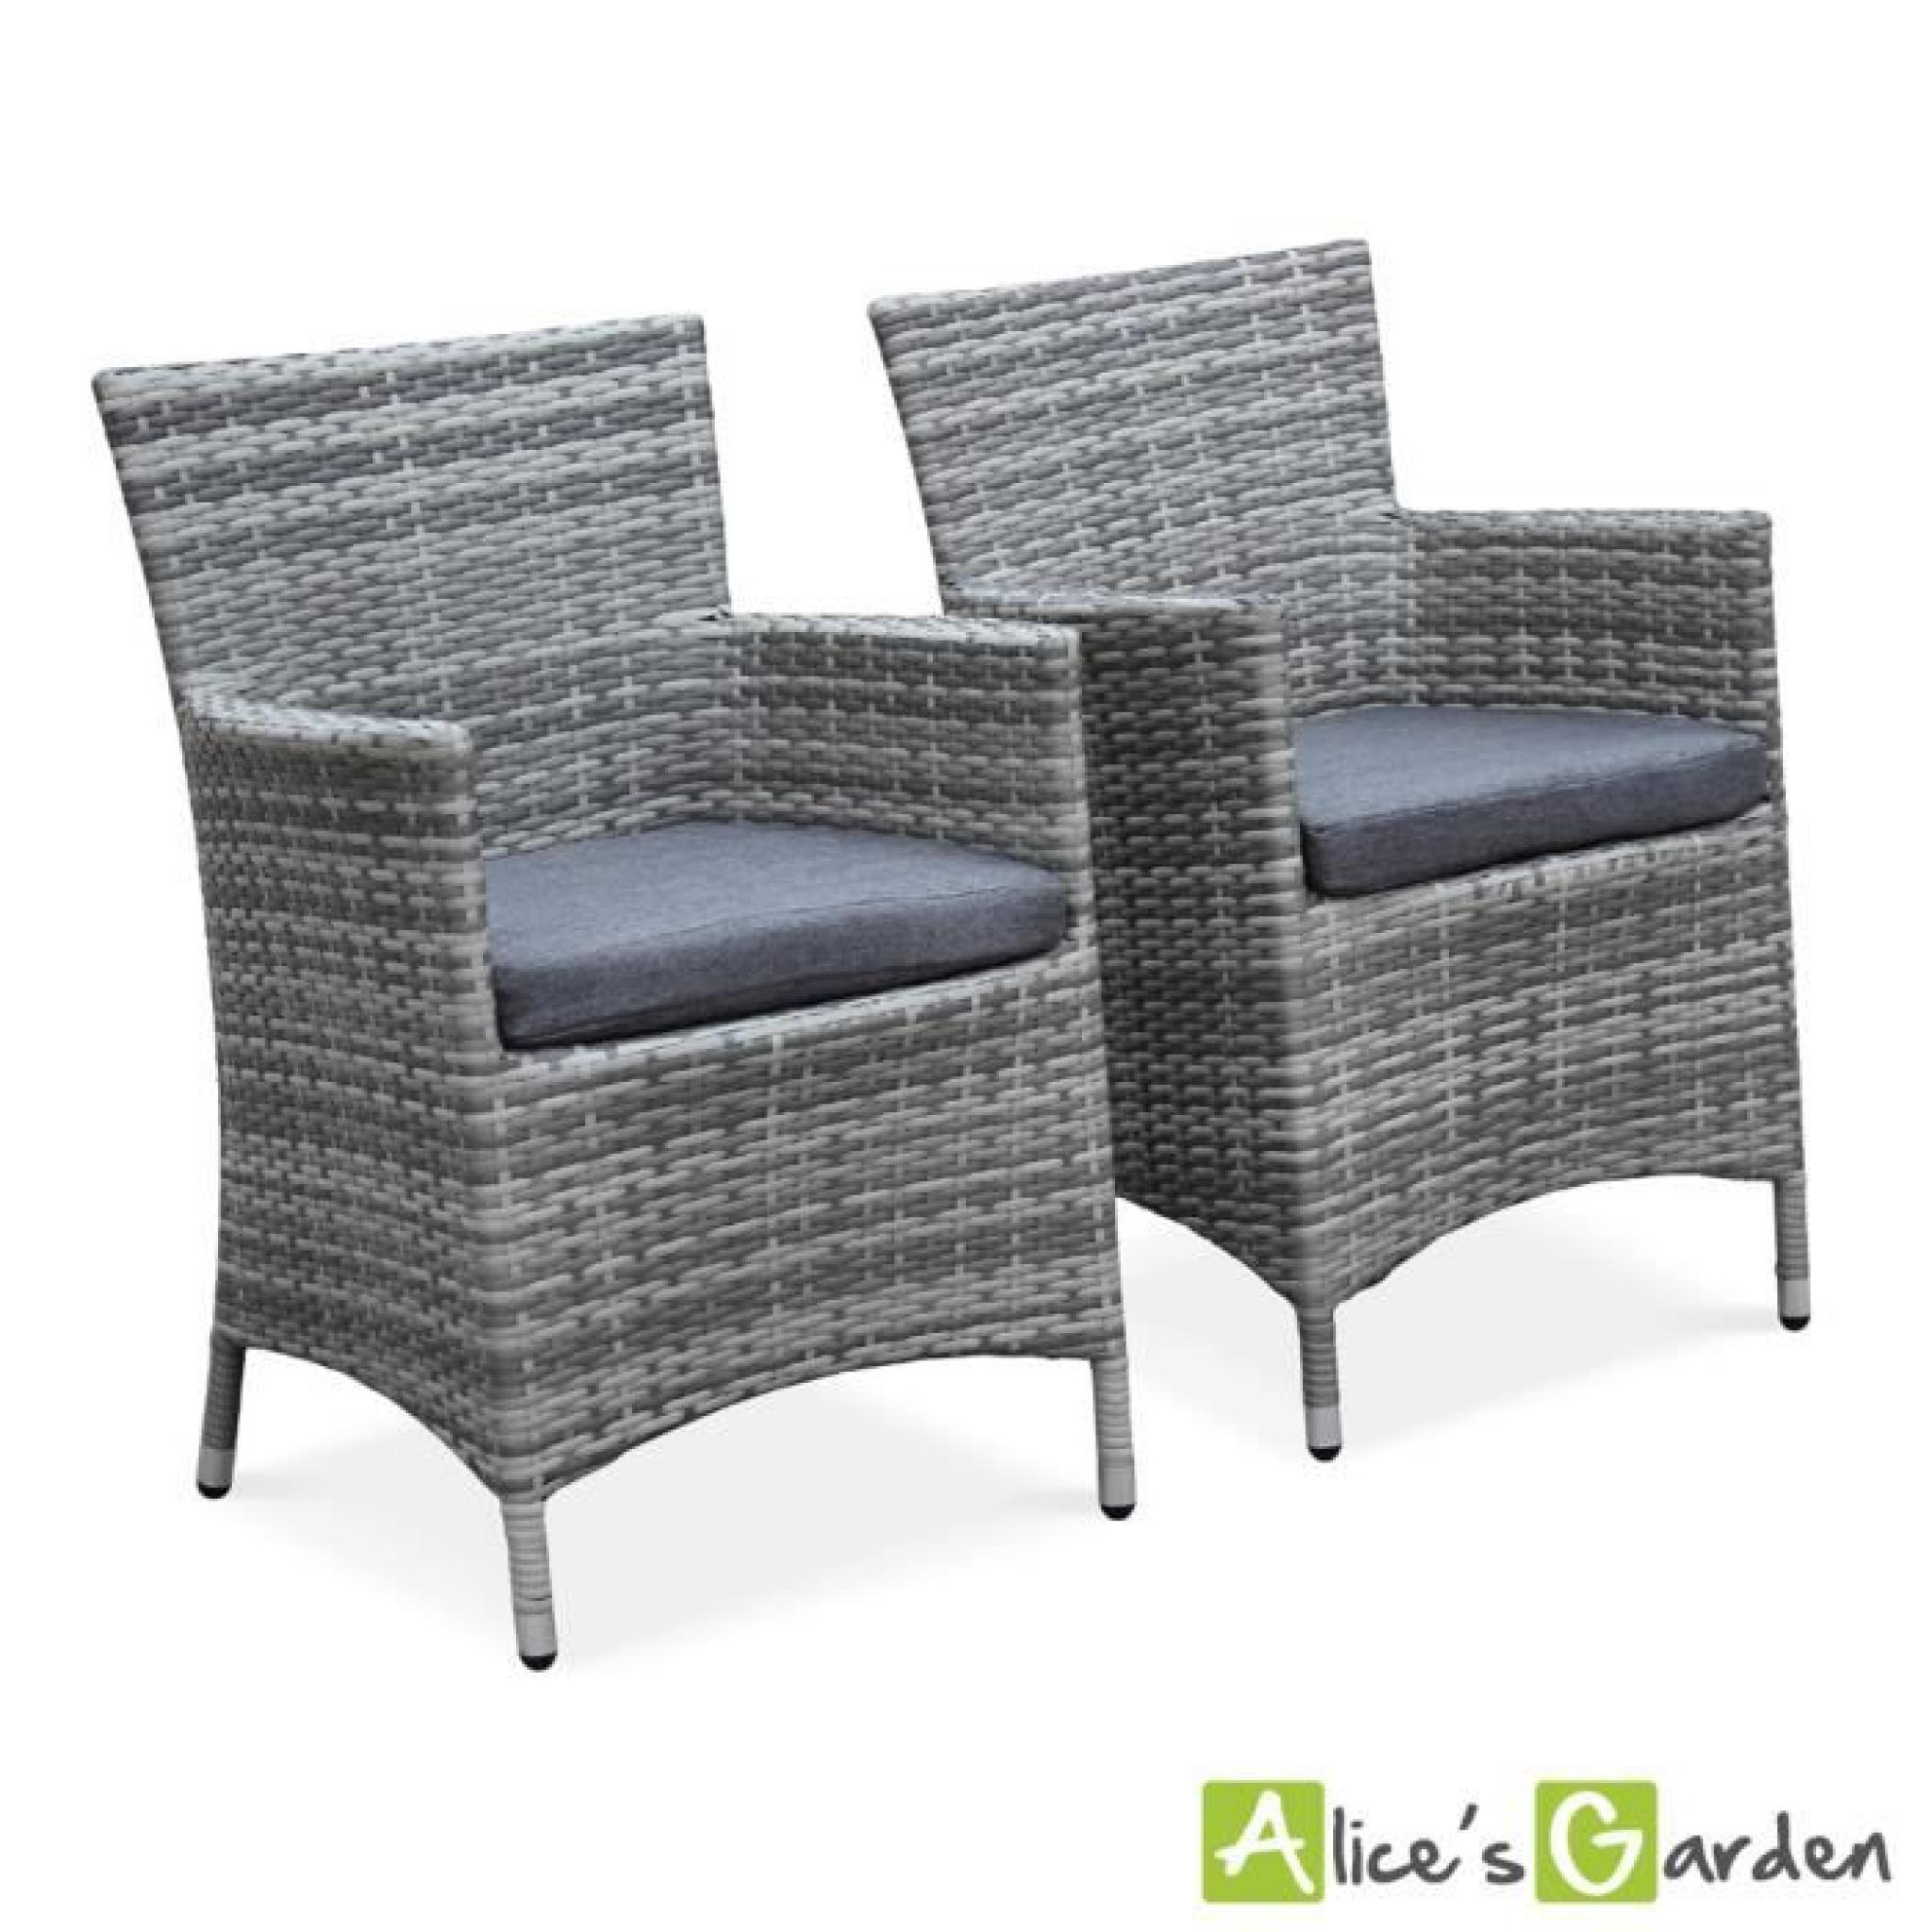 Ensemble de 2 fauteuils de jardin palermo nuances de gris - Salon de jardin caligari nuance de gris ...